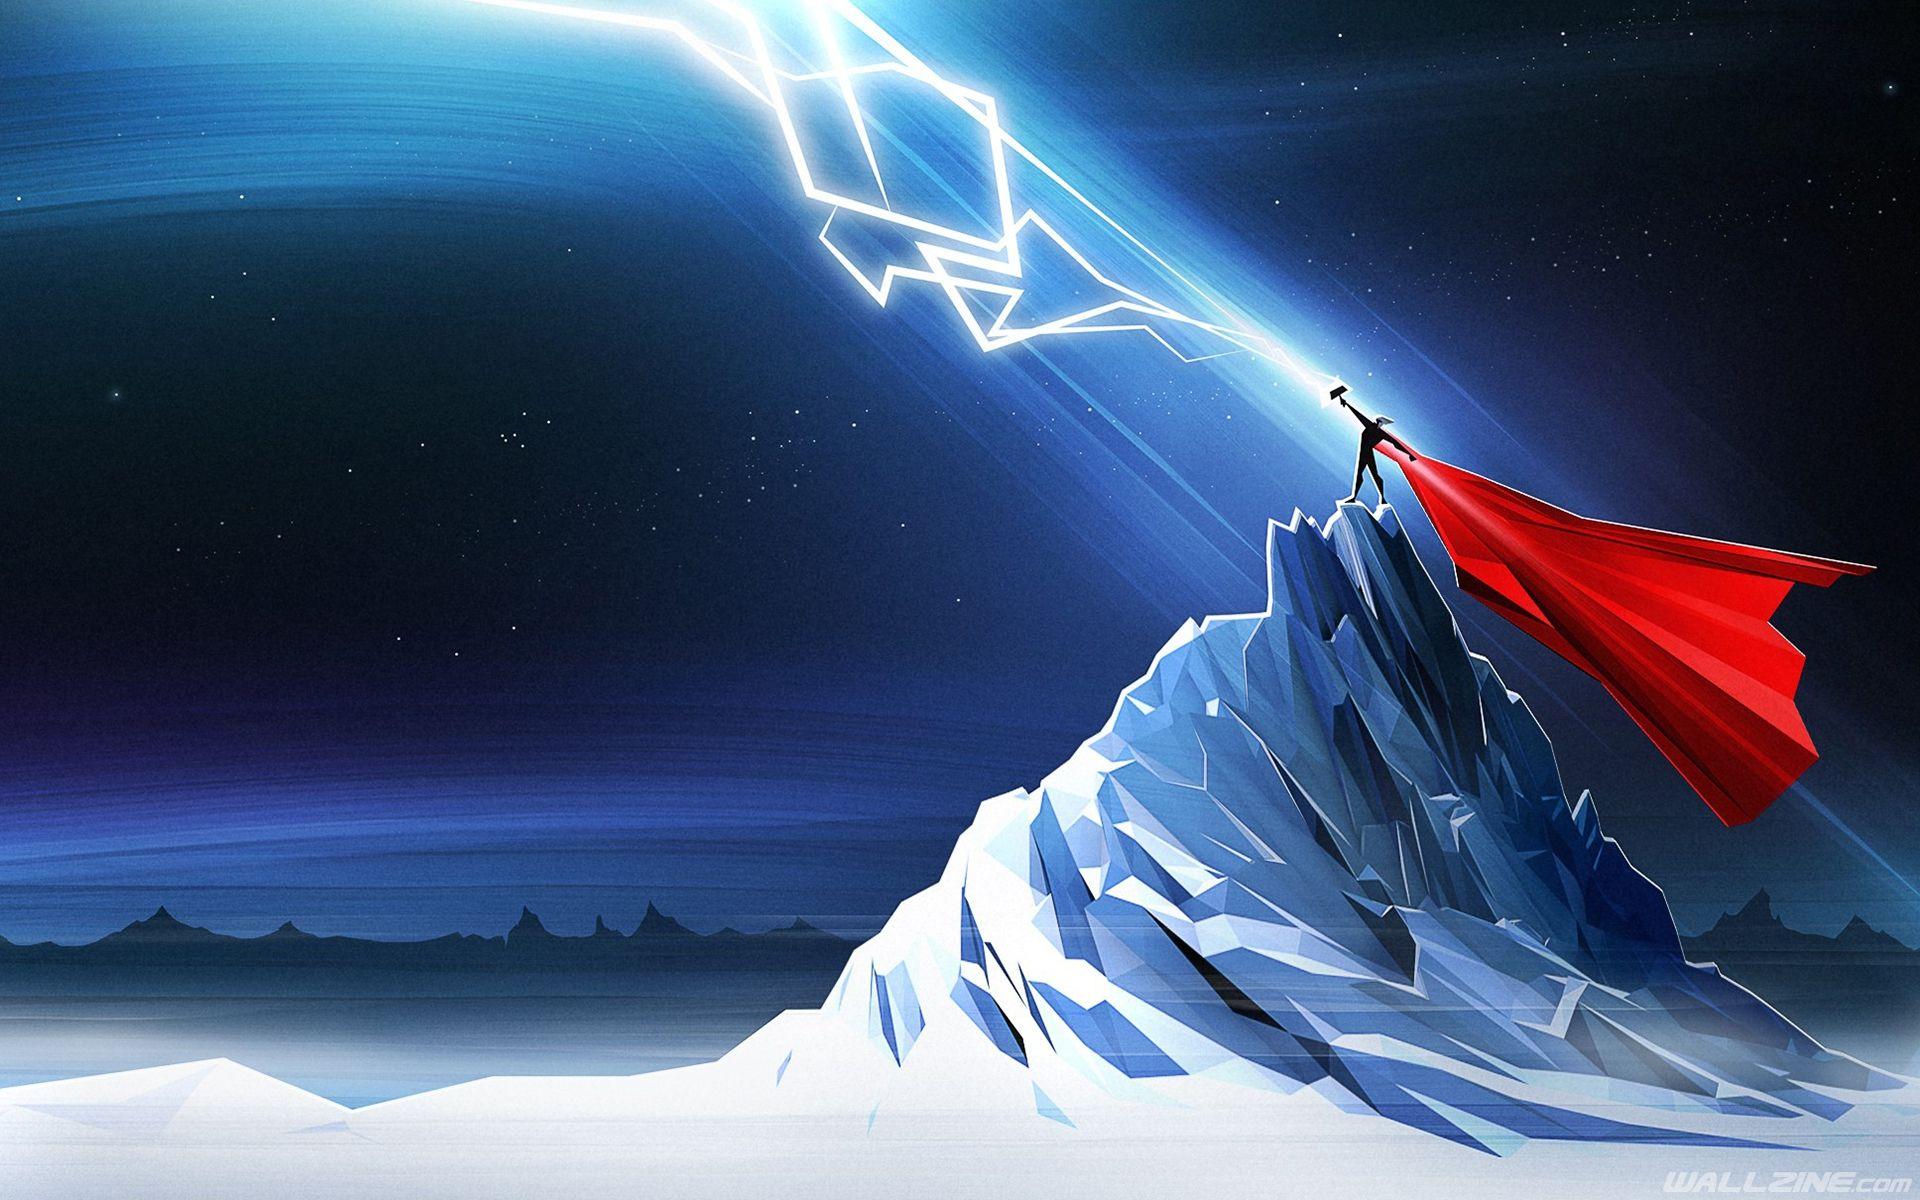 Thor Lightning Art Hd Desktop Wallpaper Wallzine Com Thor Wallpaper Marvel Wallpaper Hd Marvel Comics Wallpaper